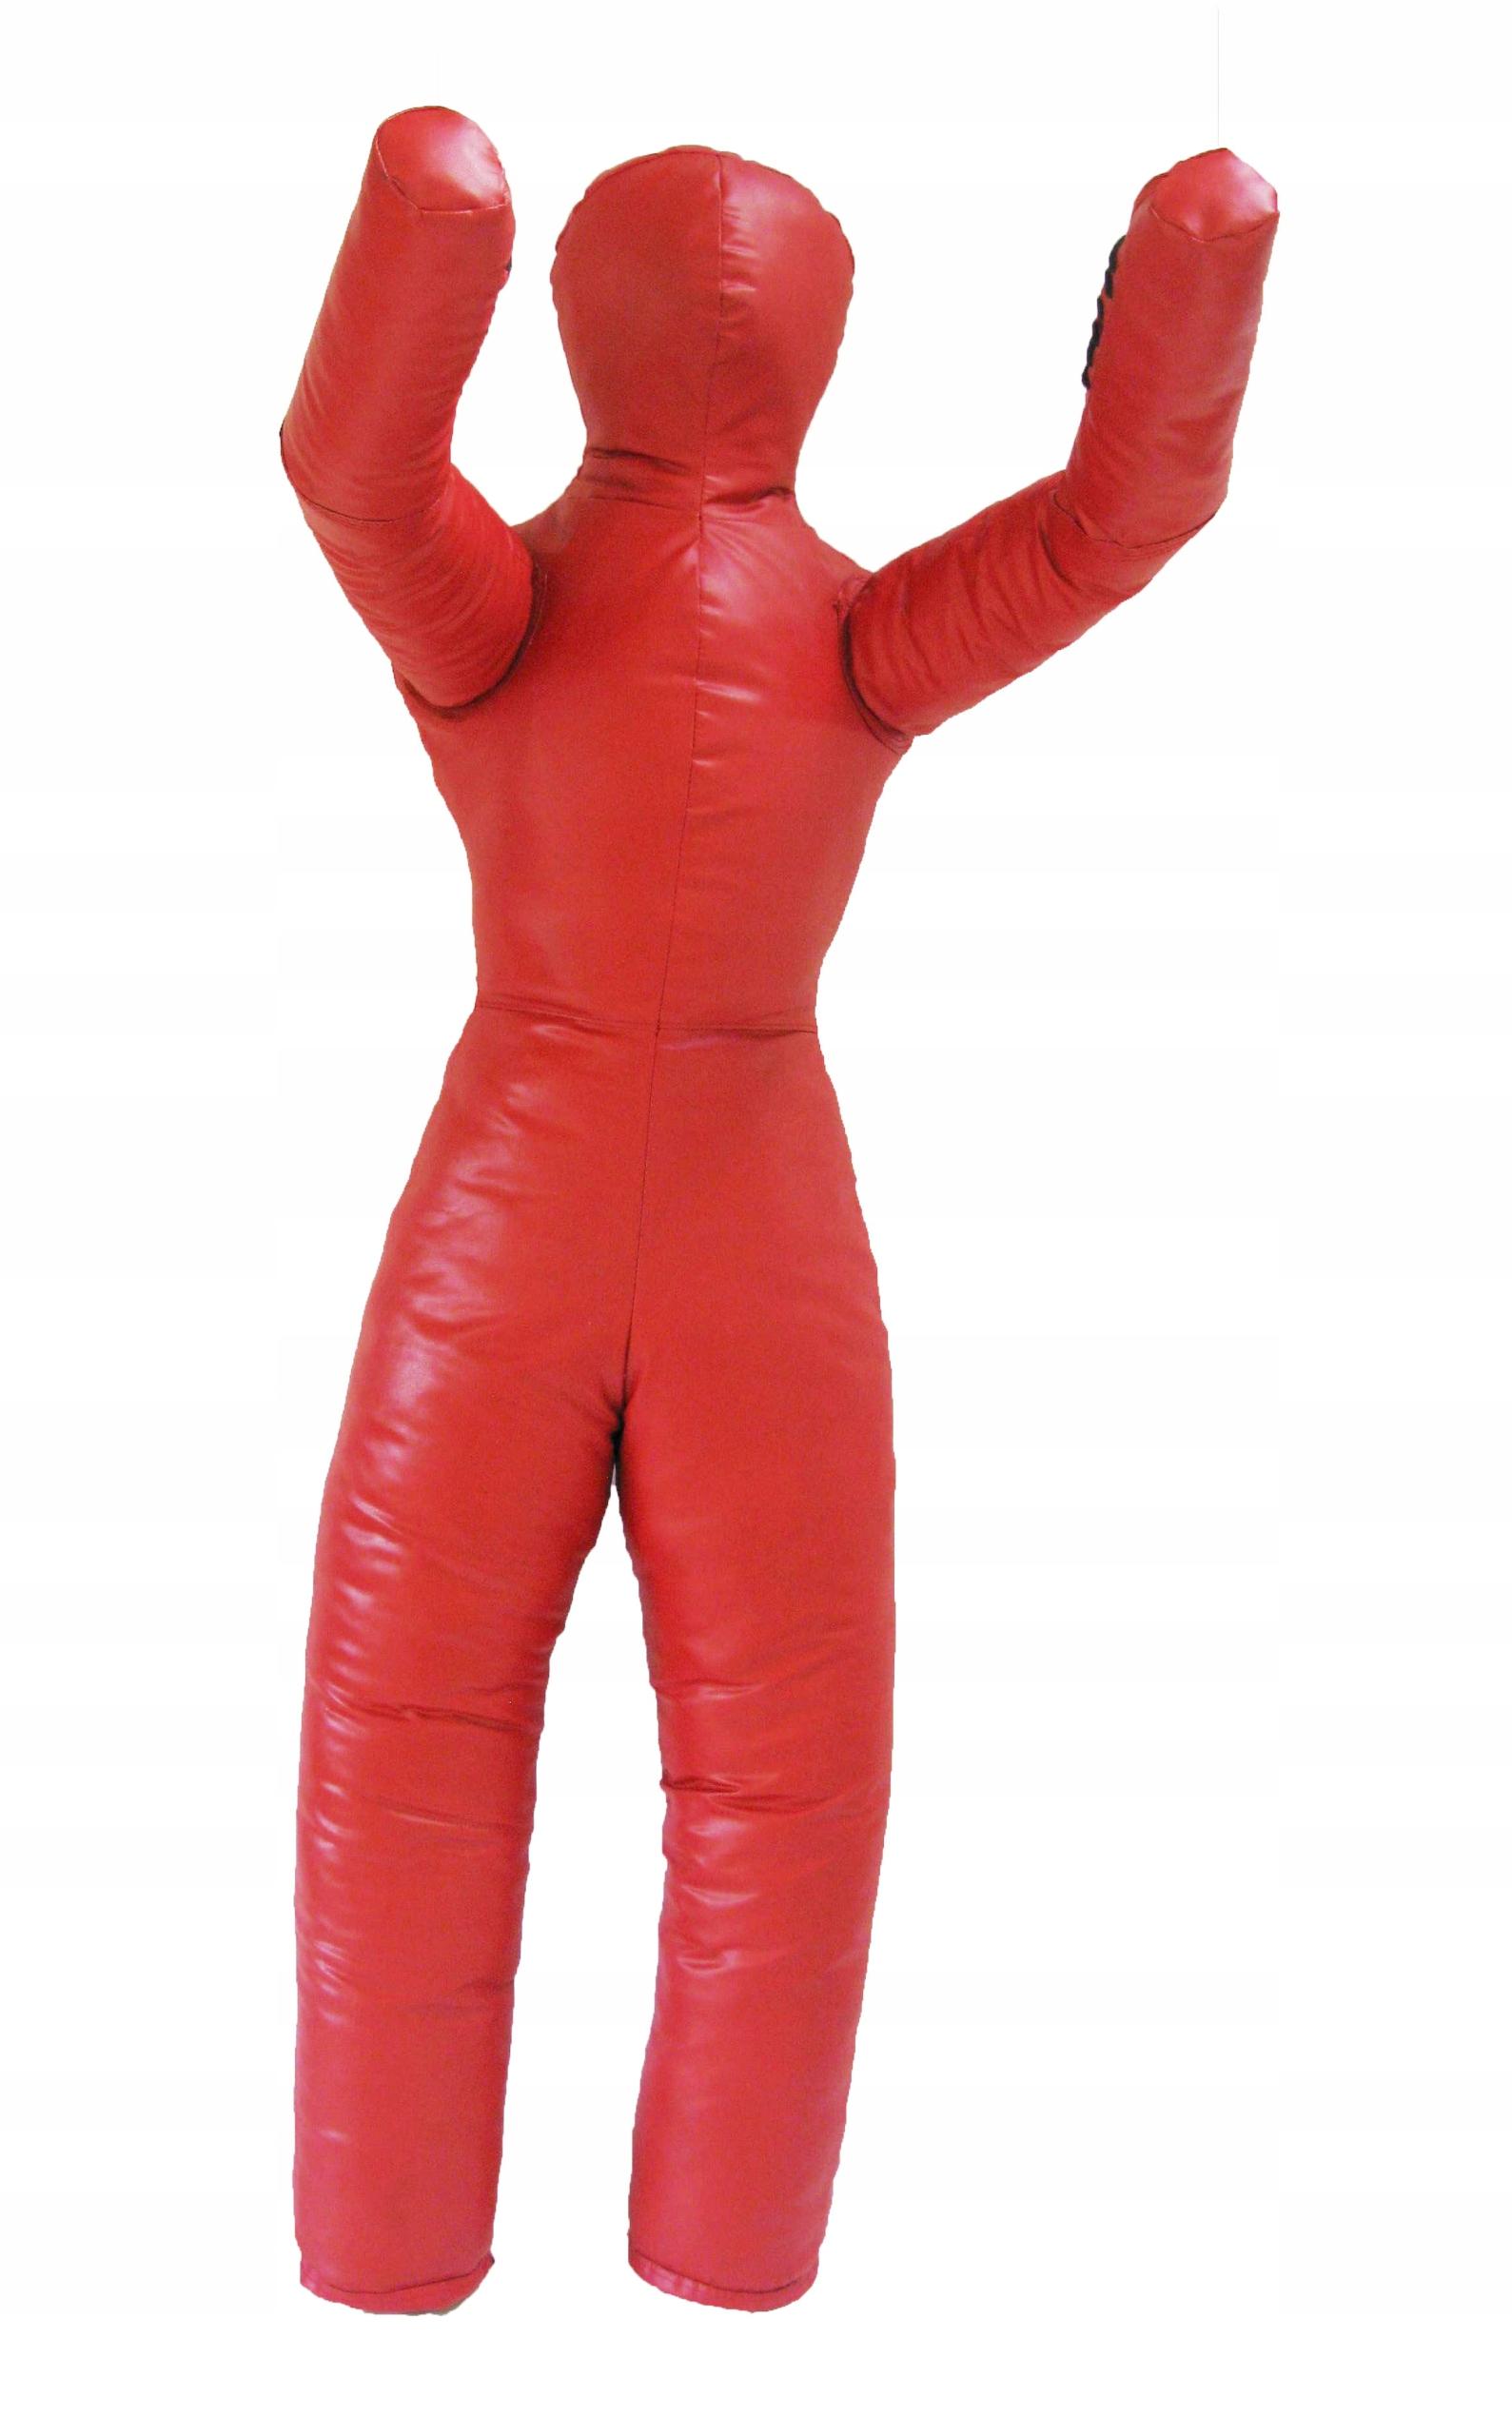 Manekýn dvanásť 120 cm / 14 kg s PVC